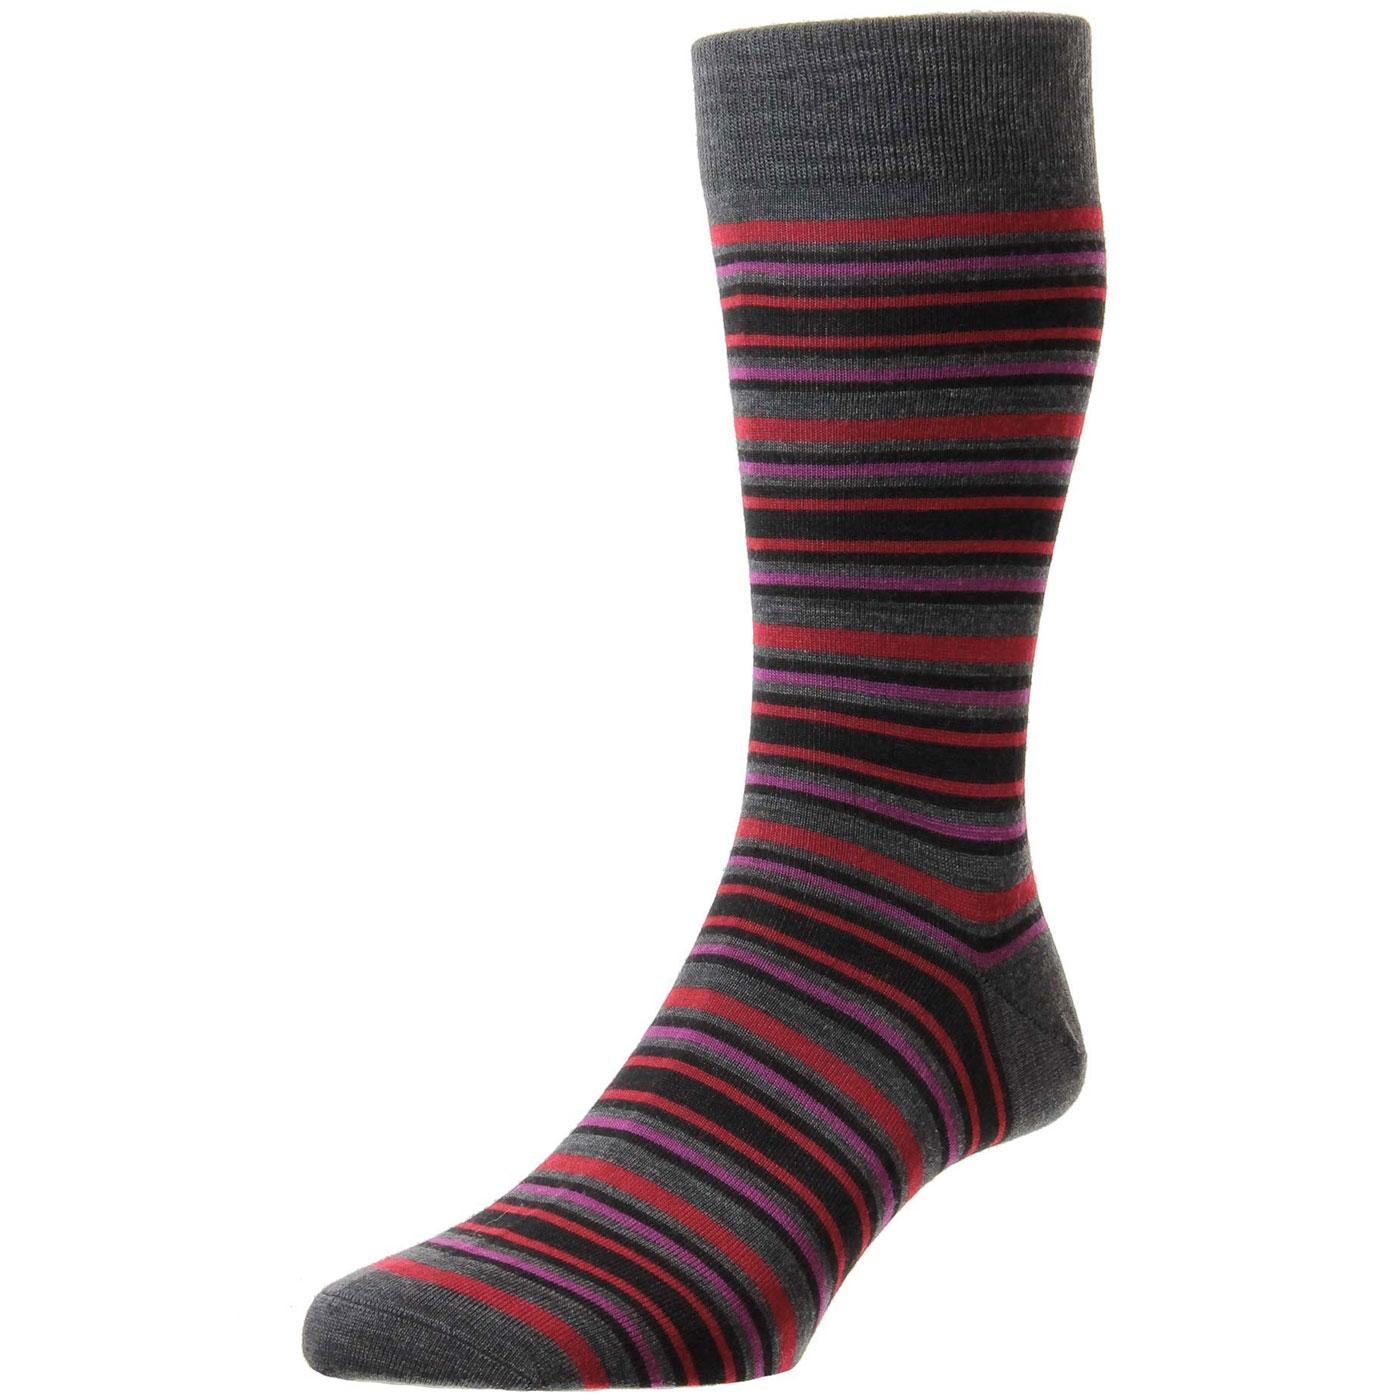 + Piper PANTHERELLA Men's Mod Striped Socks G